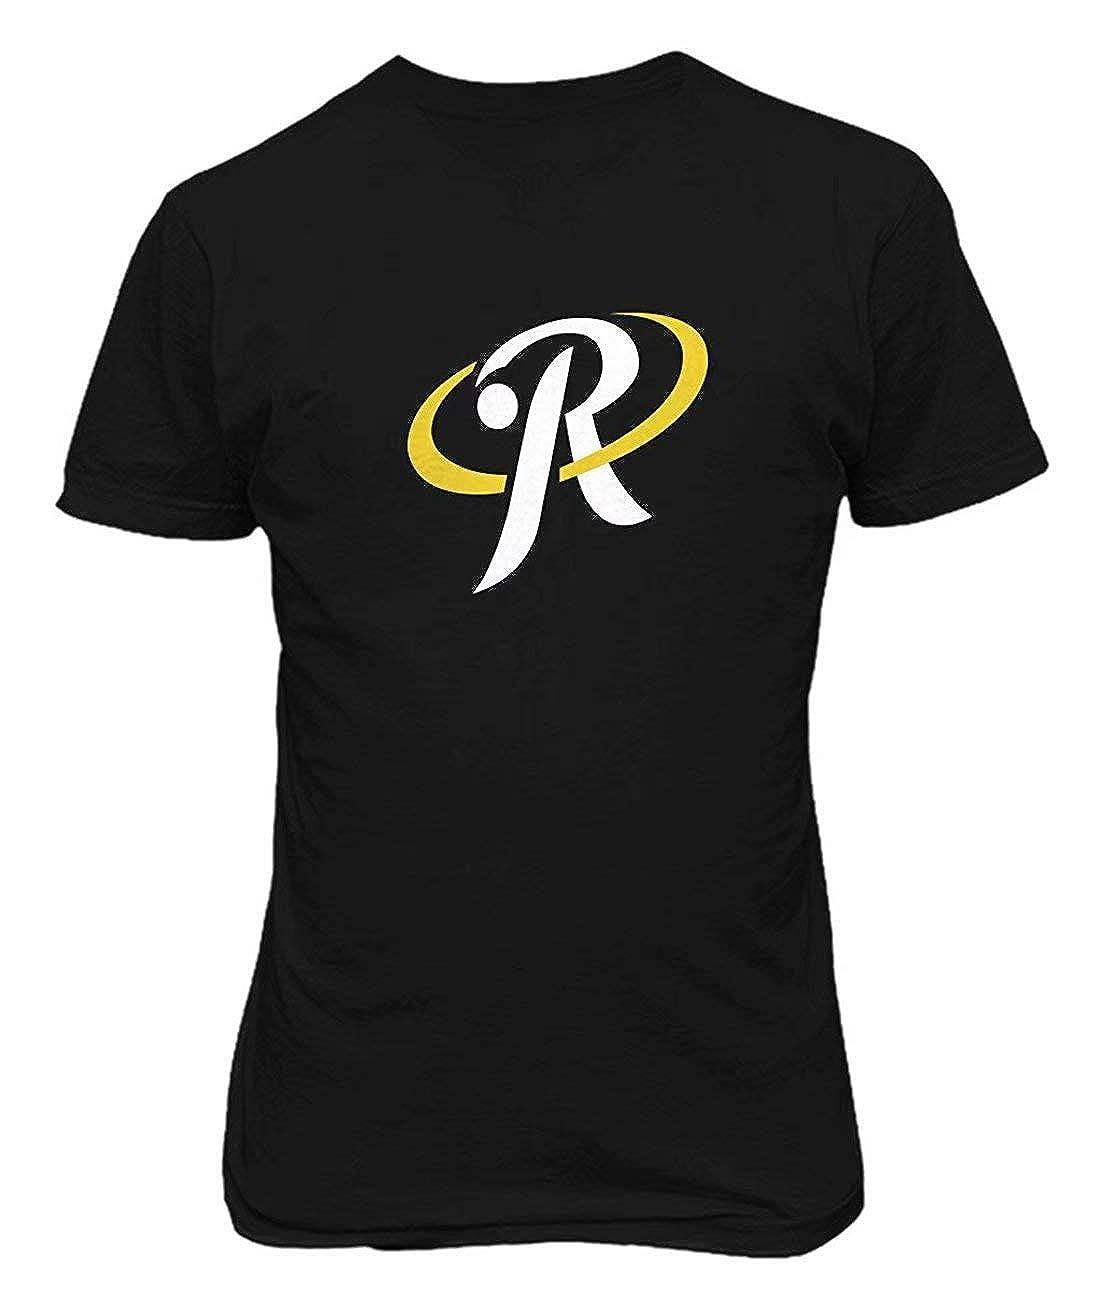 Depeal Rieleros De Aguascalientes Mexico Baseball Beisbol T Shirt Camiseta